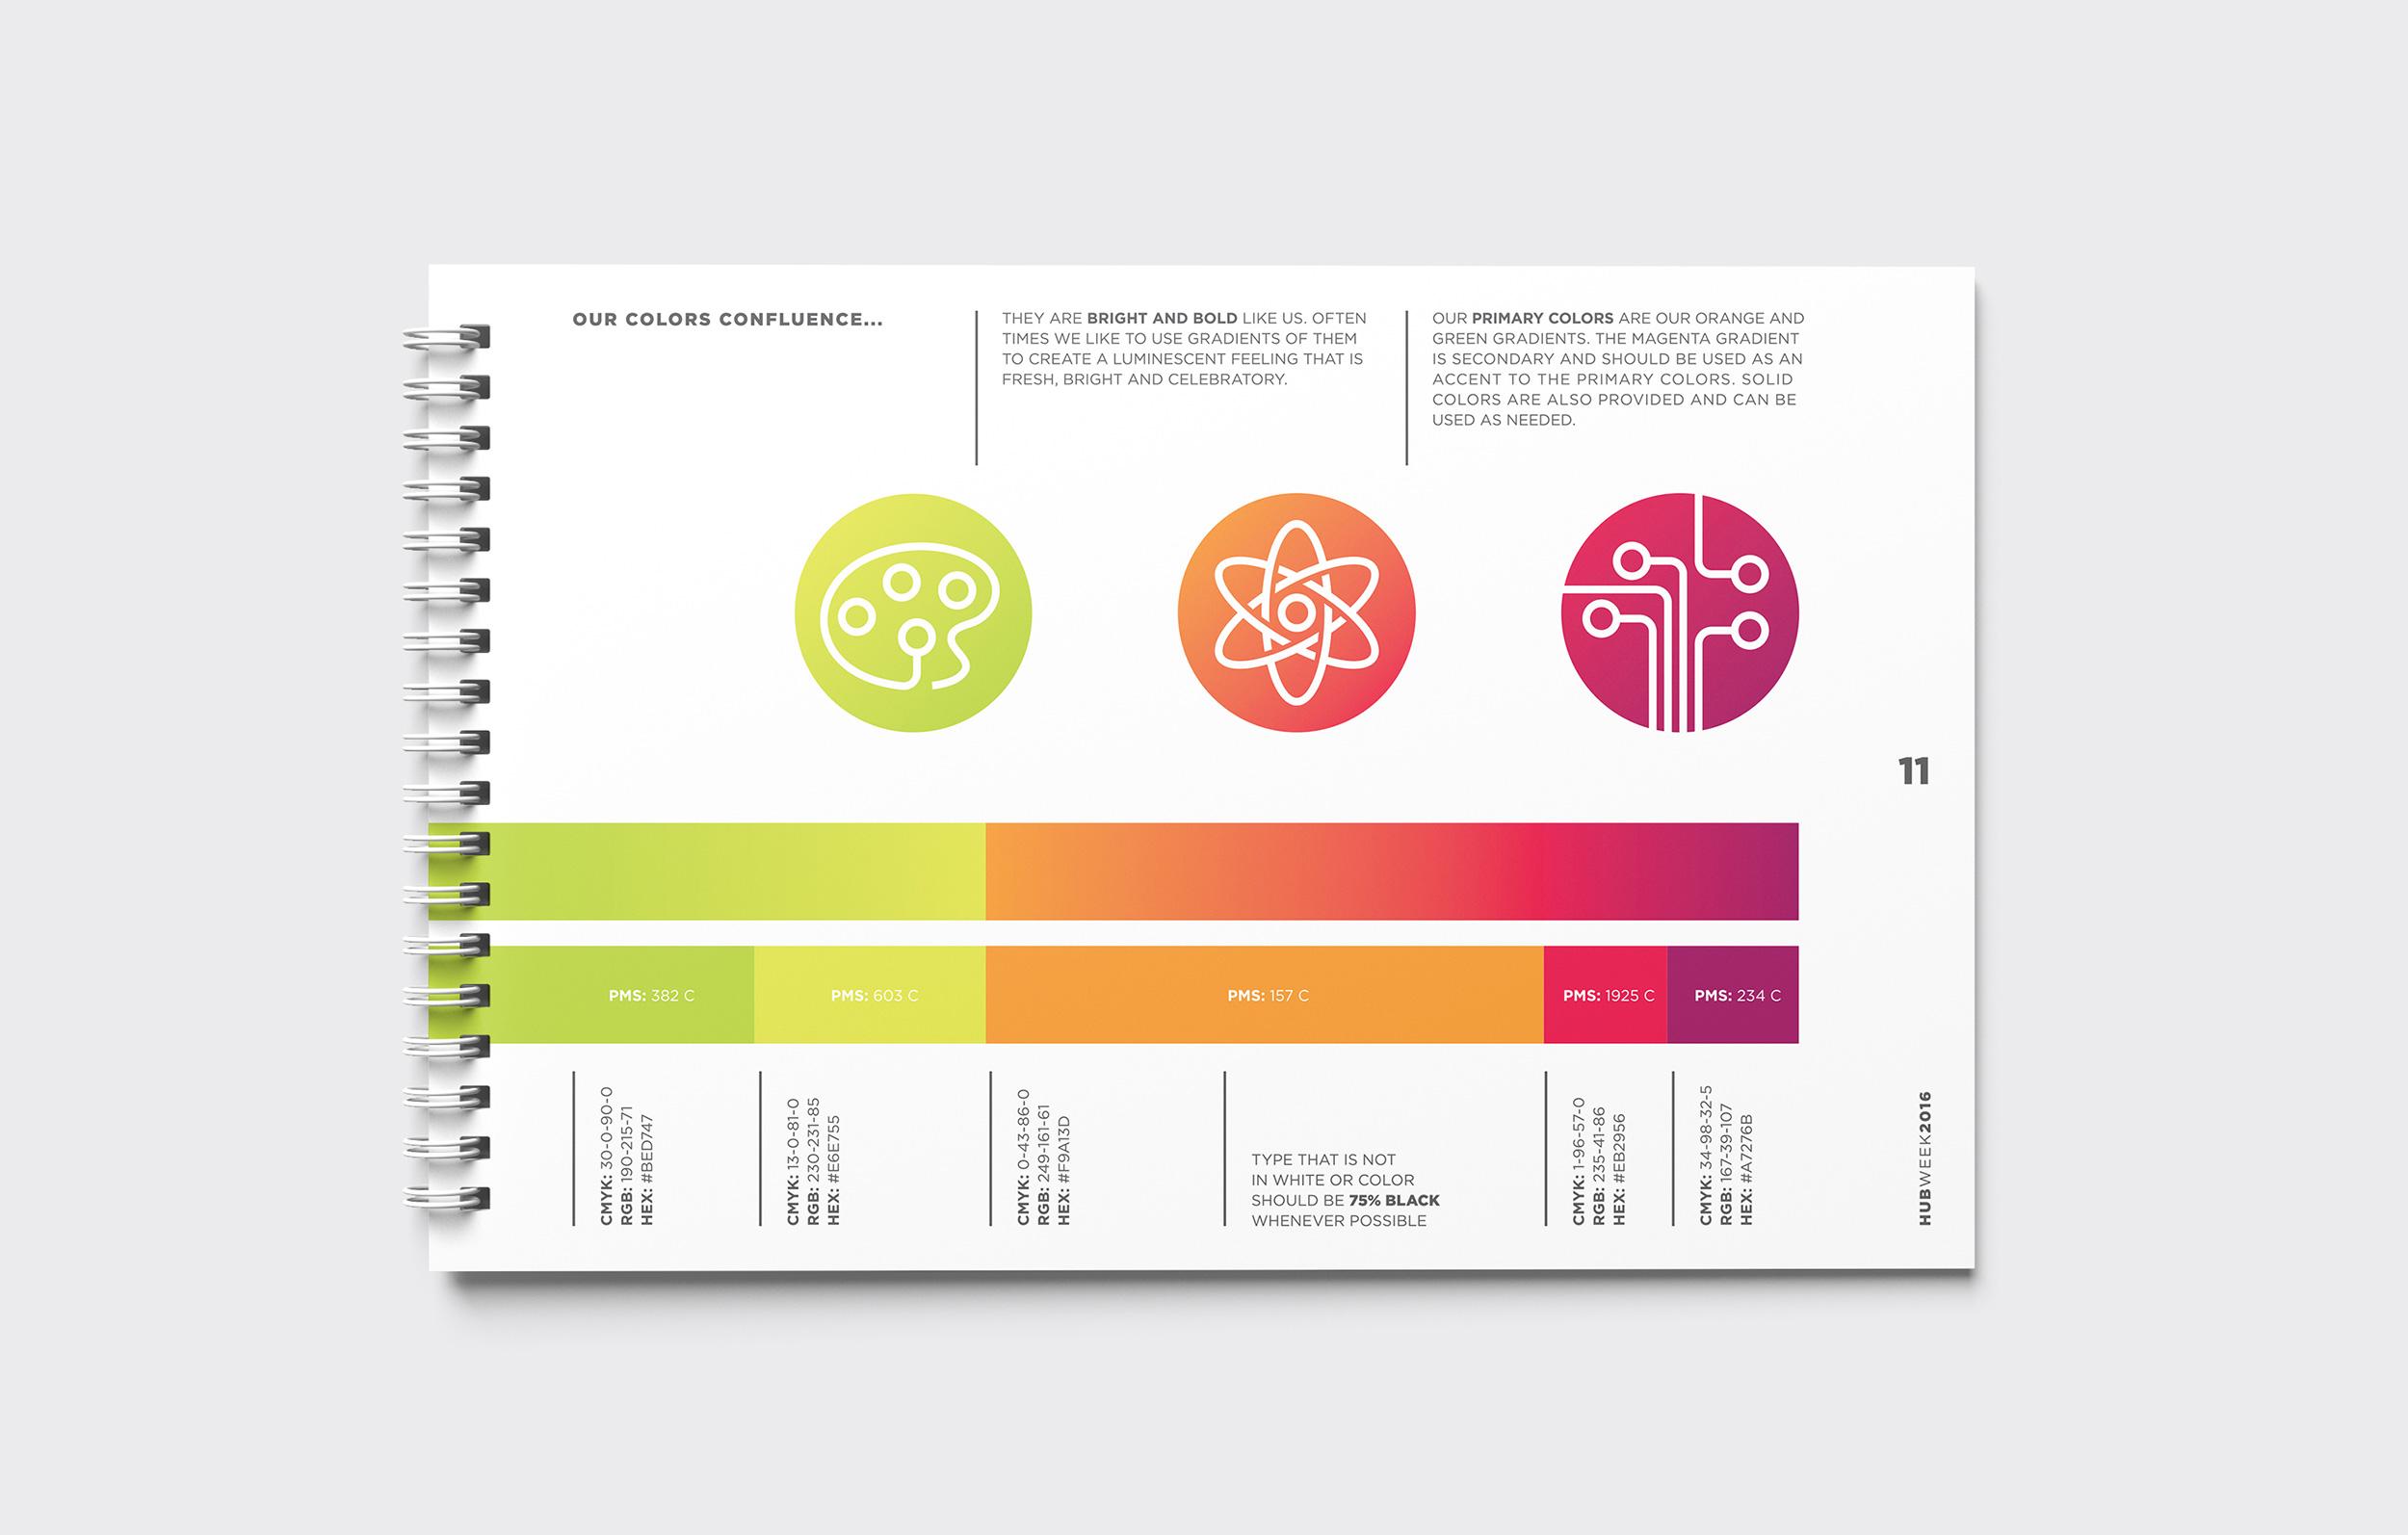 HUBweek Brand Guidelines Color